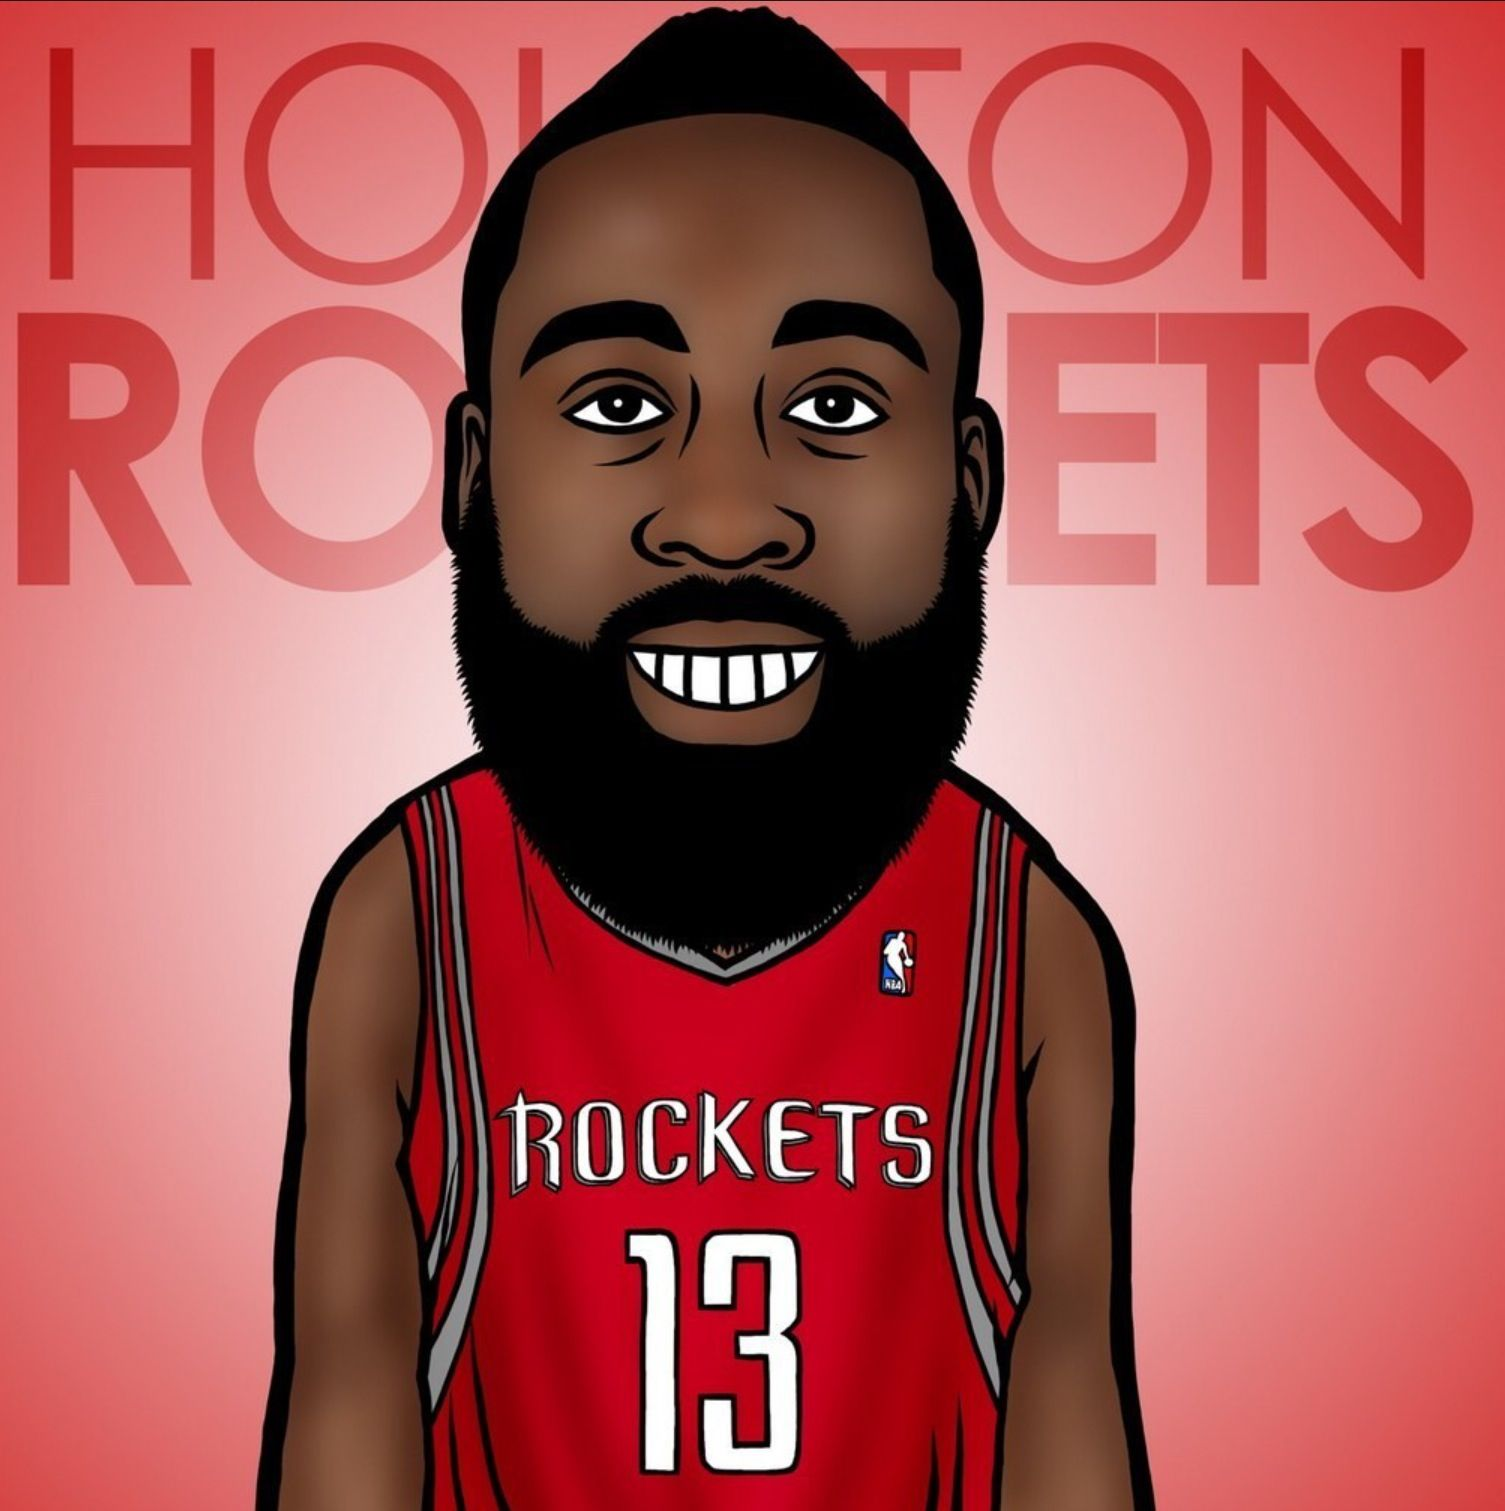 James Harden NBA cartoon image Pinterest